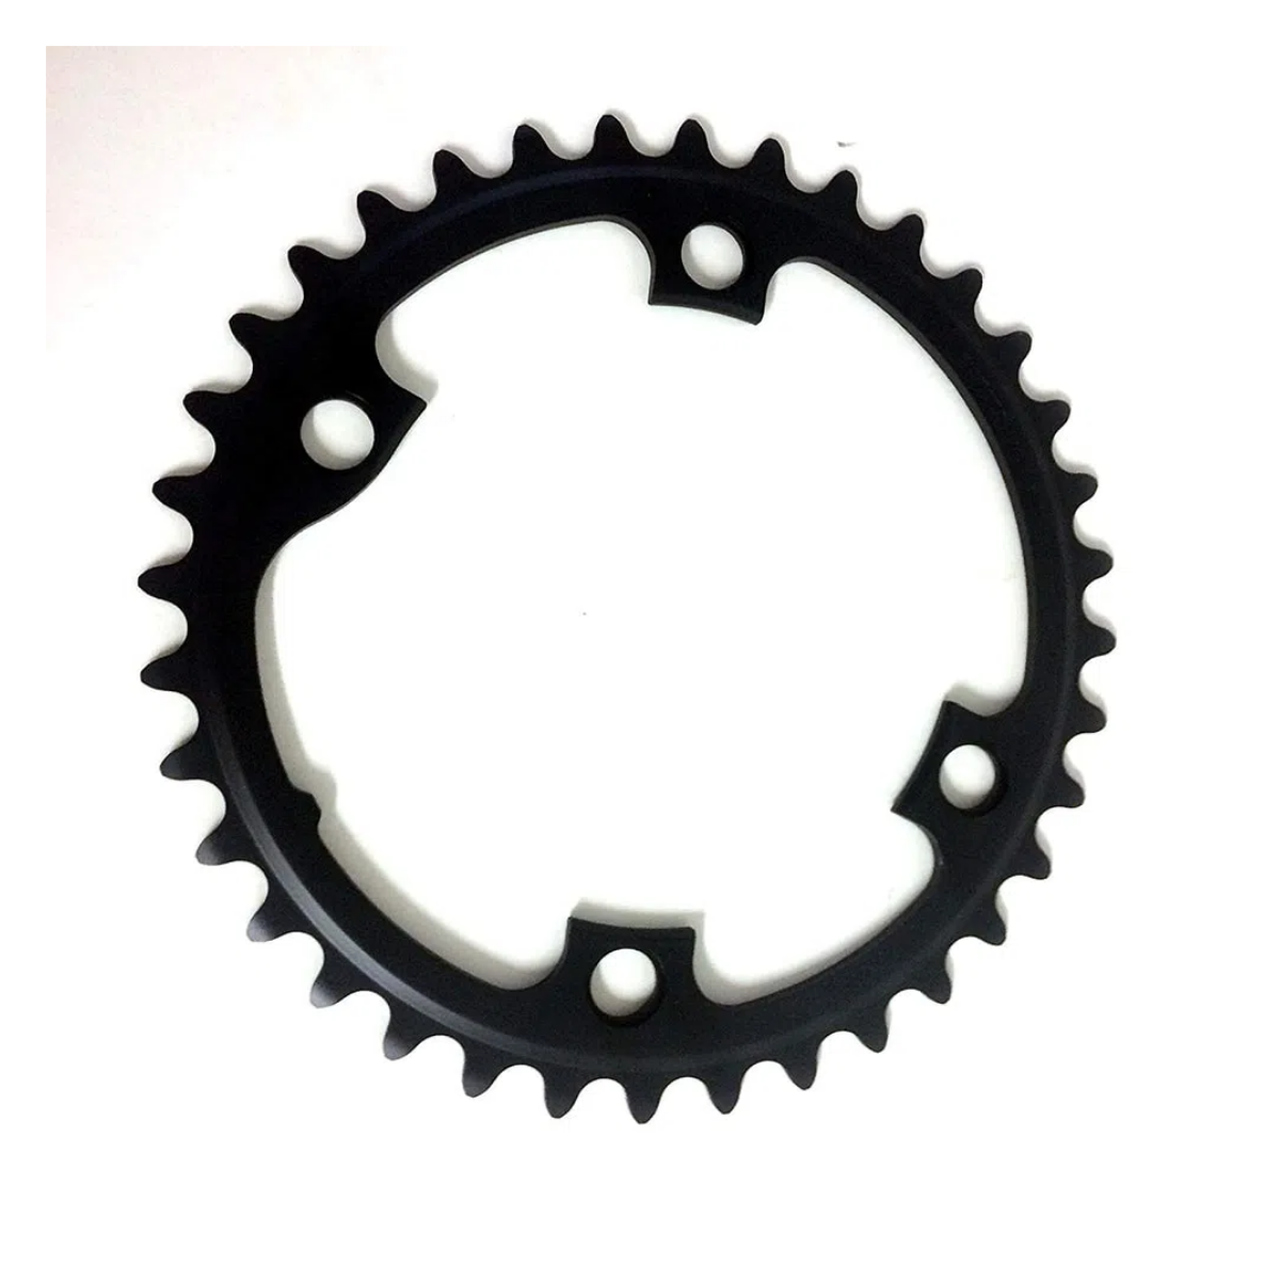 Coroa Engrenagem Diant. Shimano Ultegra FC-R8000 36D 52/36D